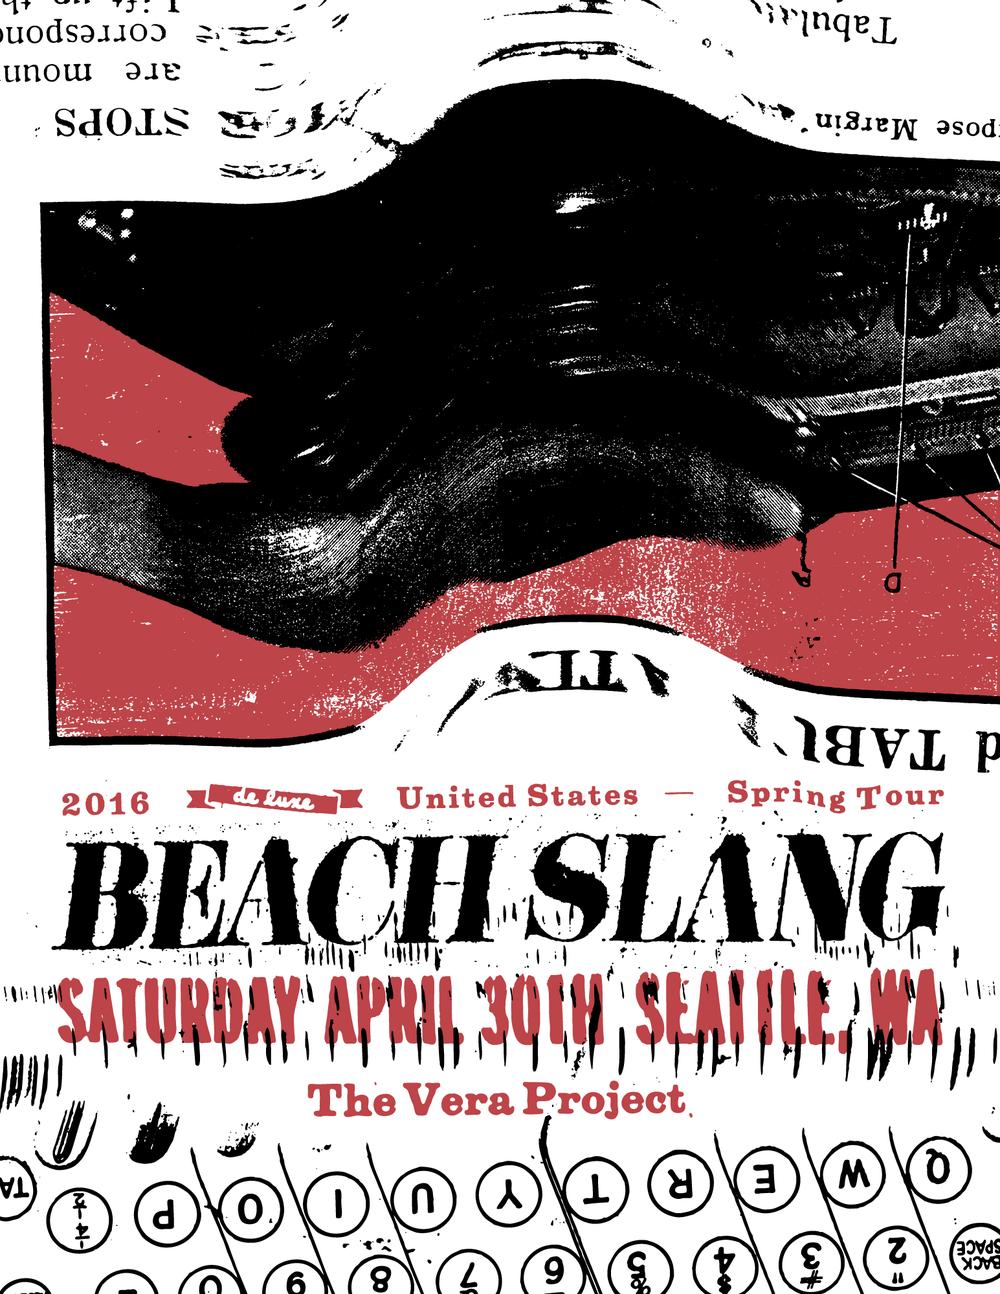 BeachSlang_4-30_Seattle_r1.png